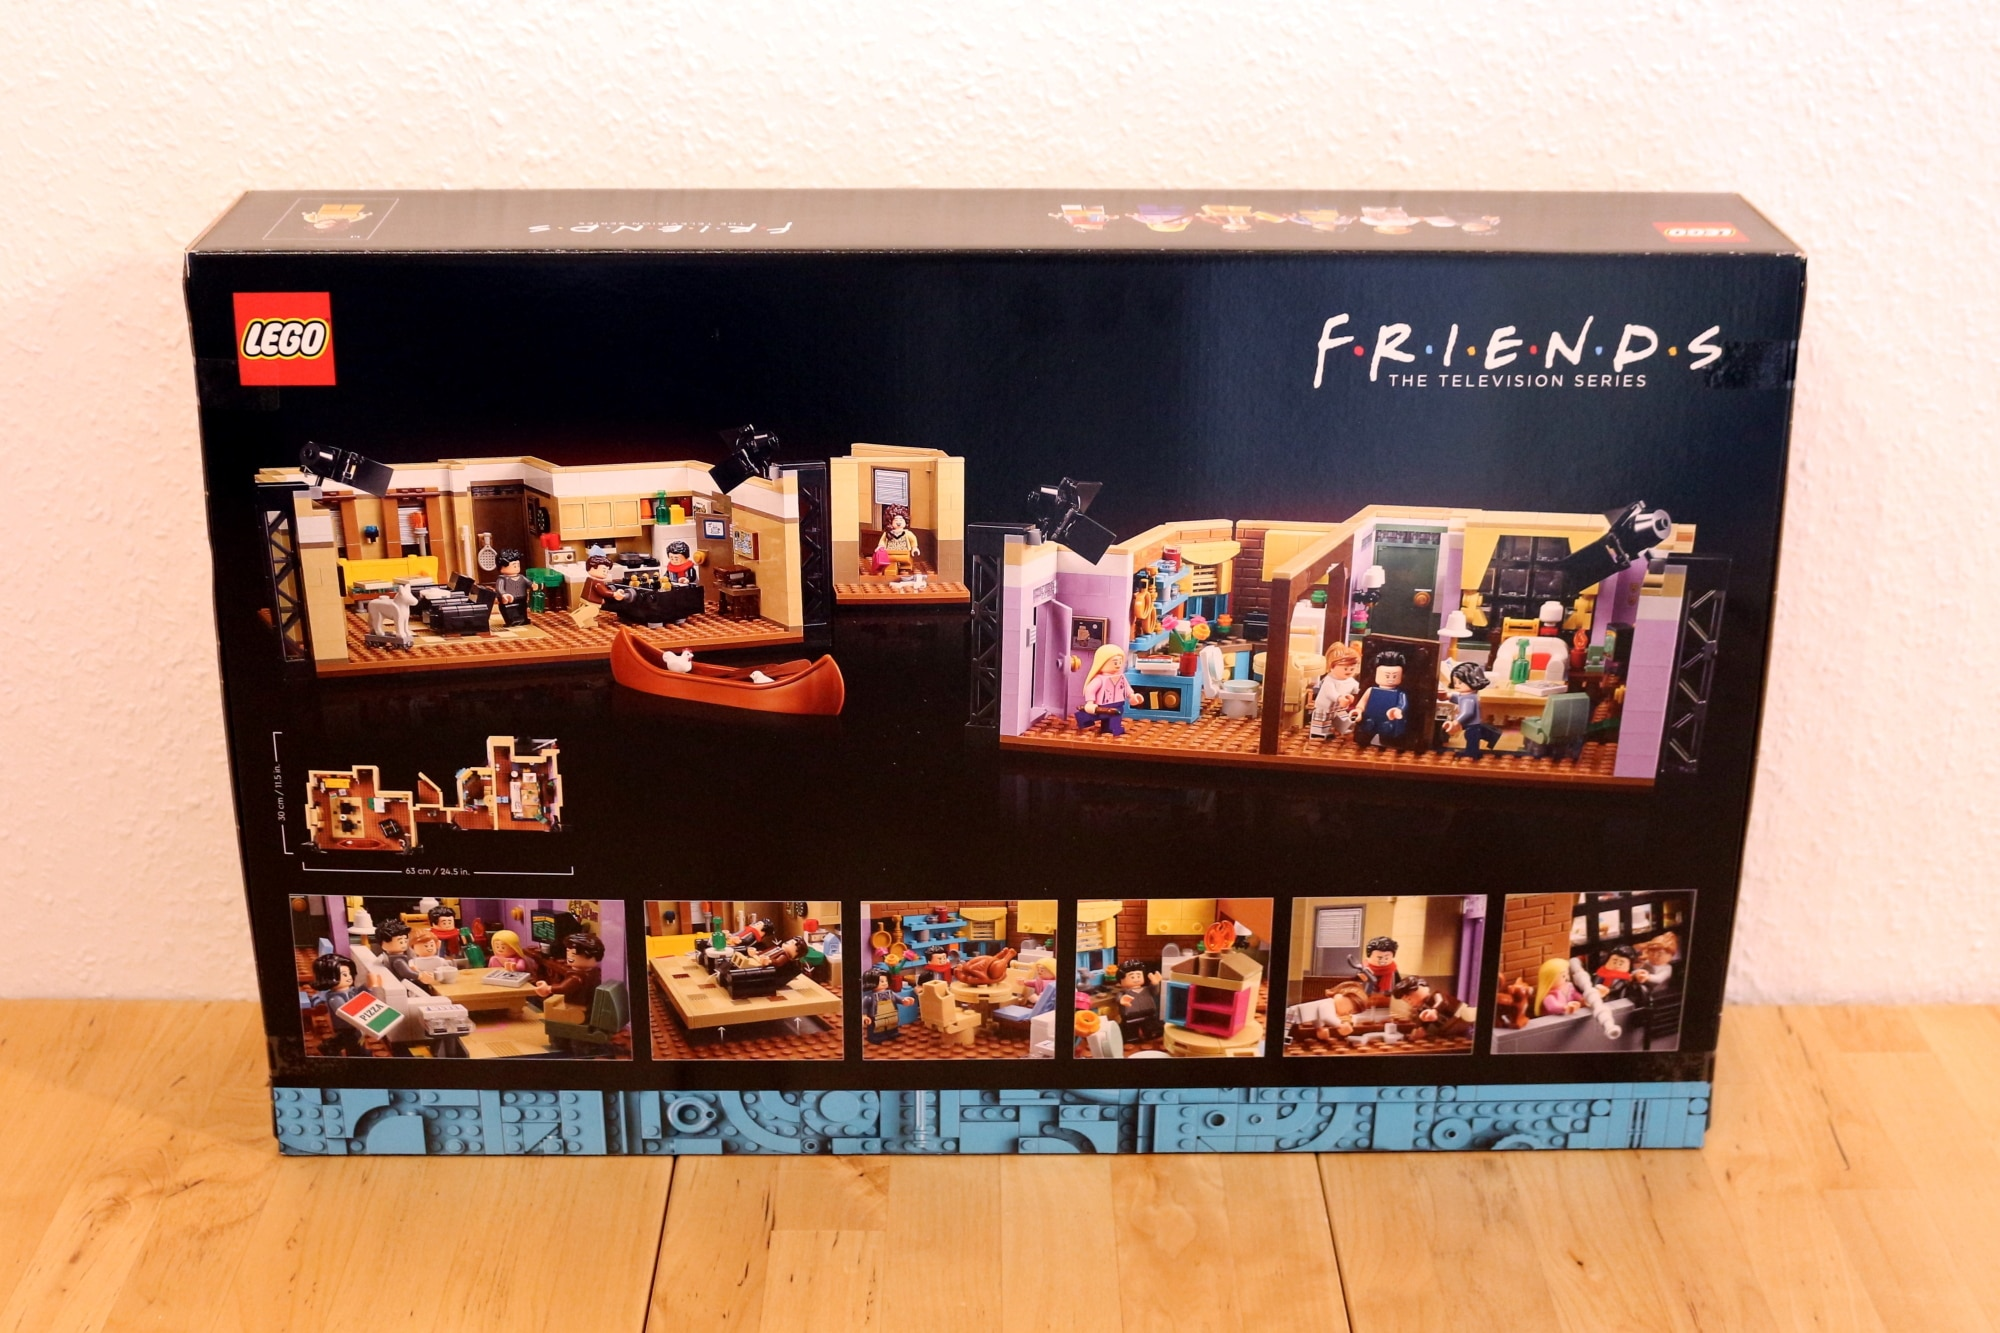 LEGO Friends 10292 The Friends Apartments 2